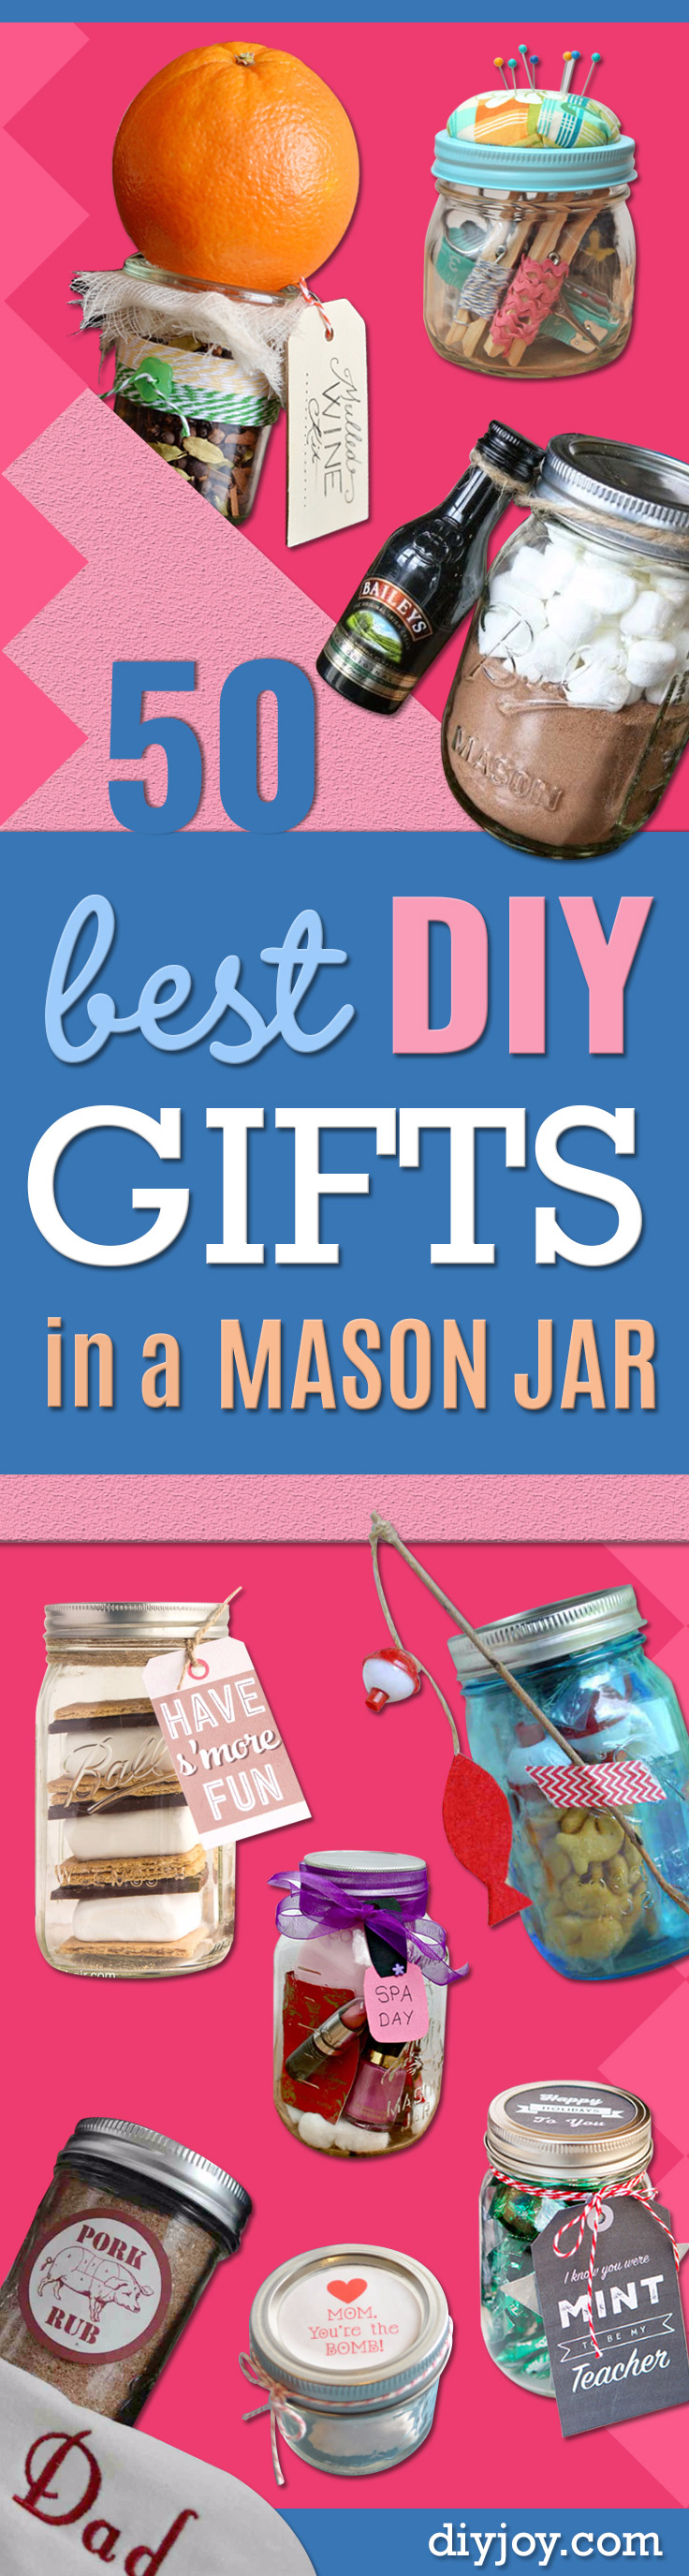 50 Best DIY Gifts In Mason Jars